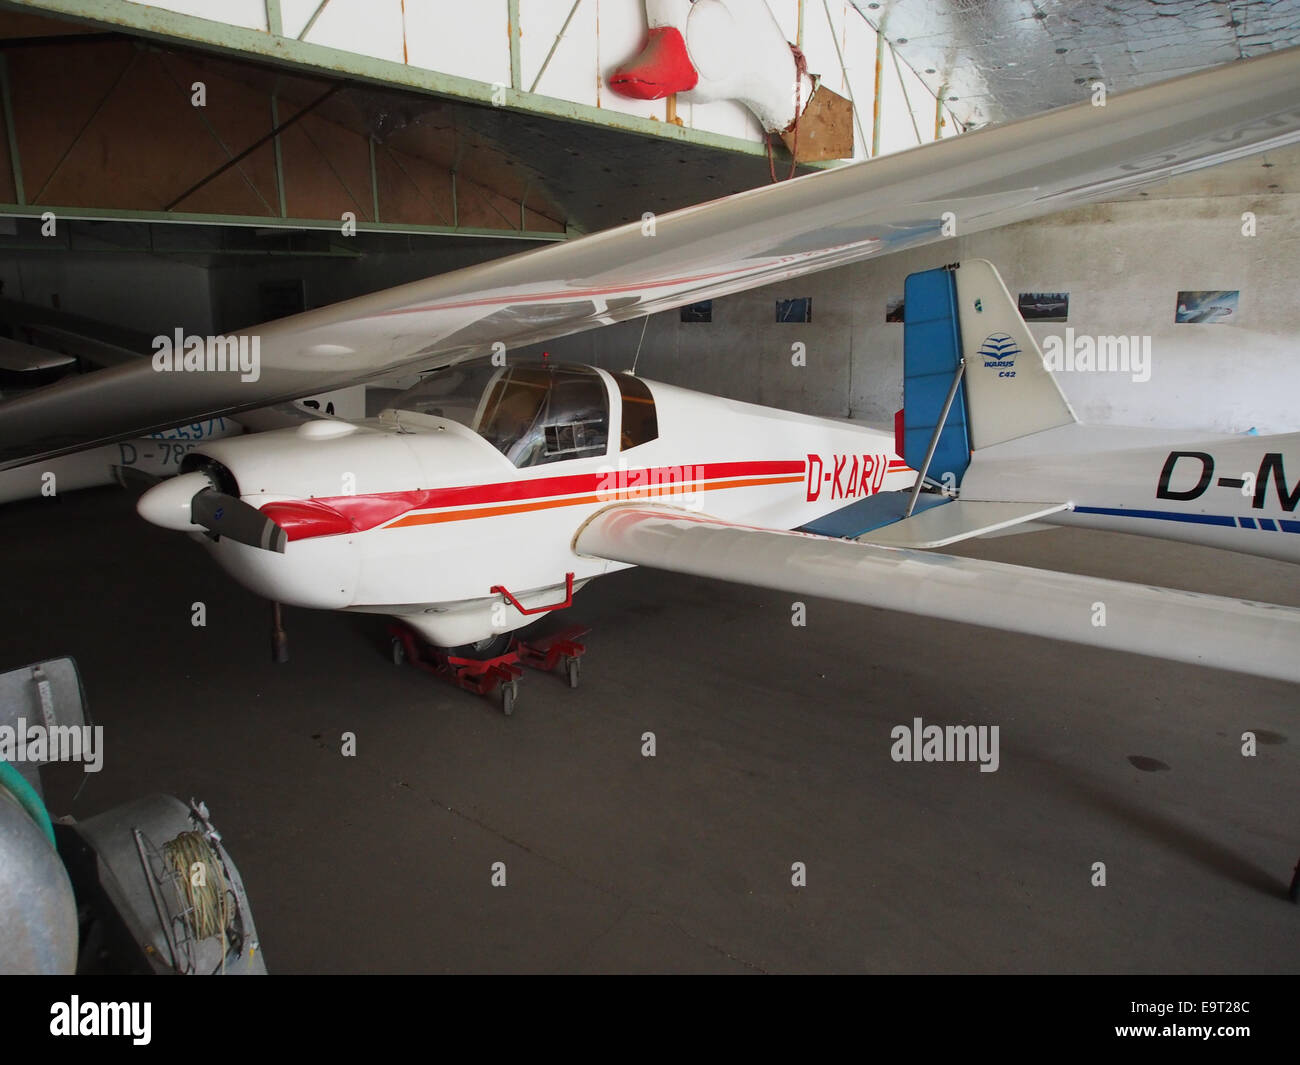 D-KARU, SCHEIBE SF - 25D-FALKE in einem Hangar am Flugplatz Daun-Senheld Stockbild